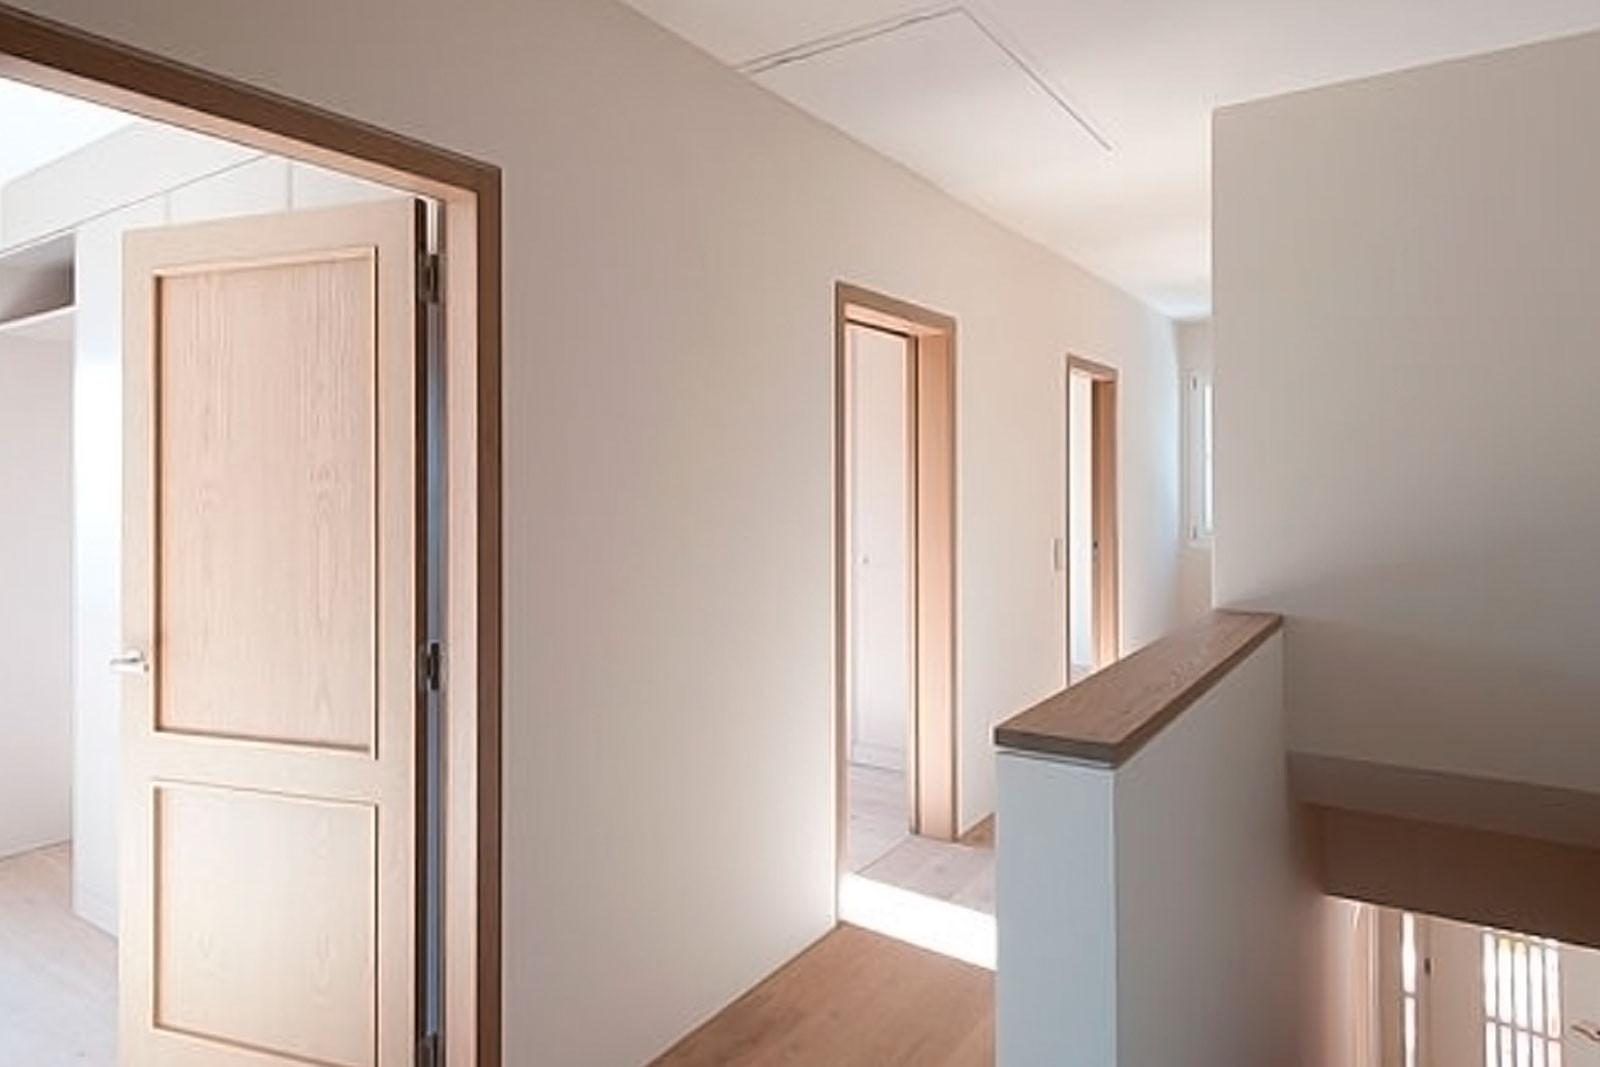 EFH Muri b. Bern, Campanile Michetti AG BernSwissSkills 2014, Savoir Social, Stefan Zwicky Architekt Zürich